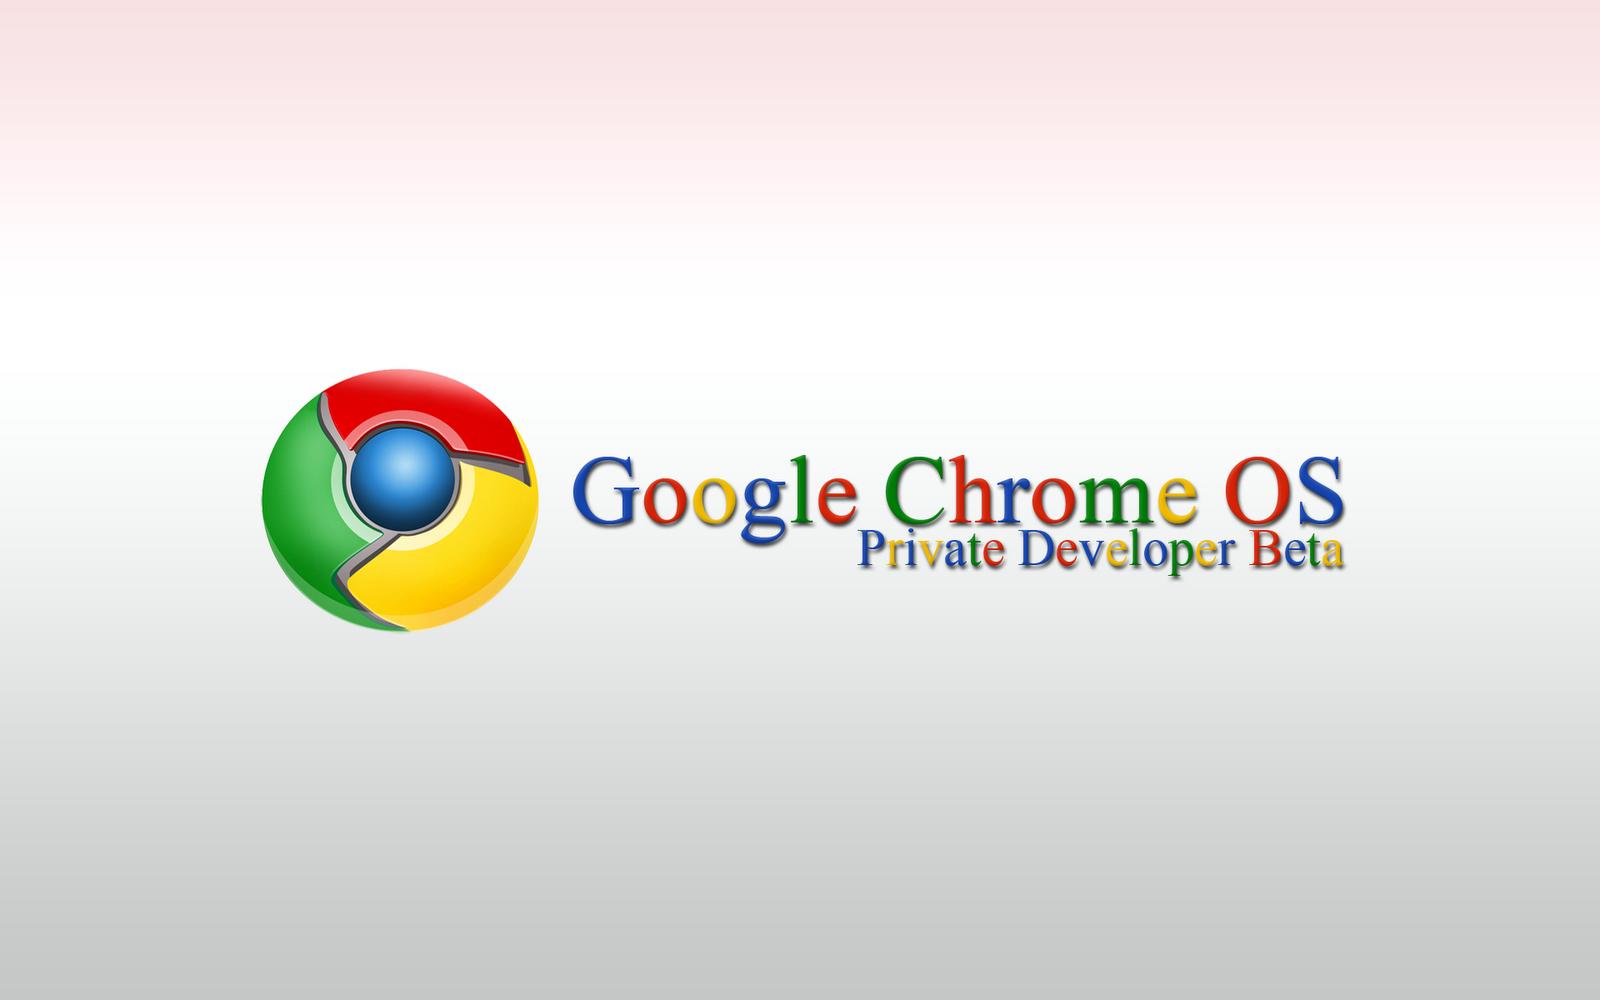 http://4.bp.blogspot.com/-R1pQg2oNazI/TfVpm5HRThI/AAAAAAAAHtM/9XiLHaOuPVM/s1600/Google+Chrome+OS+Wallpaper+HQ.png